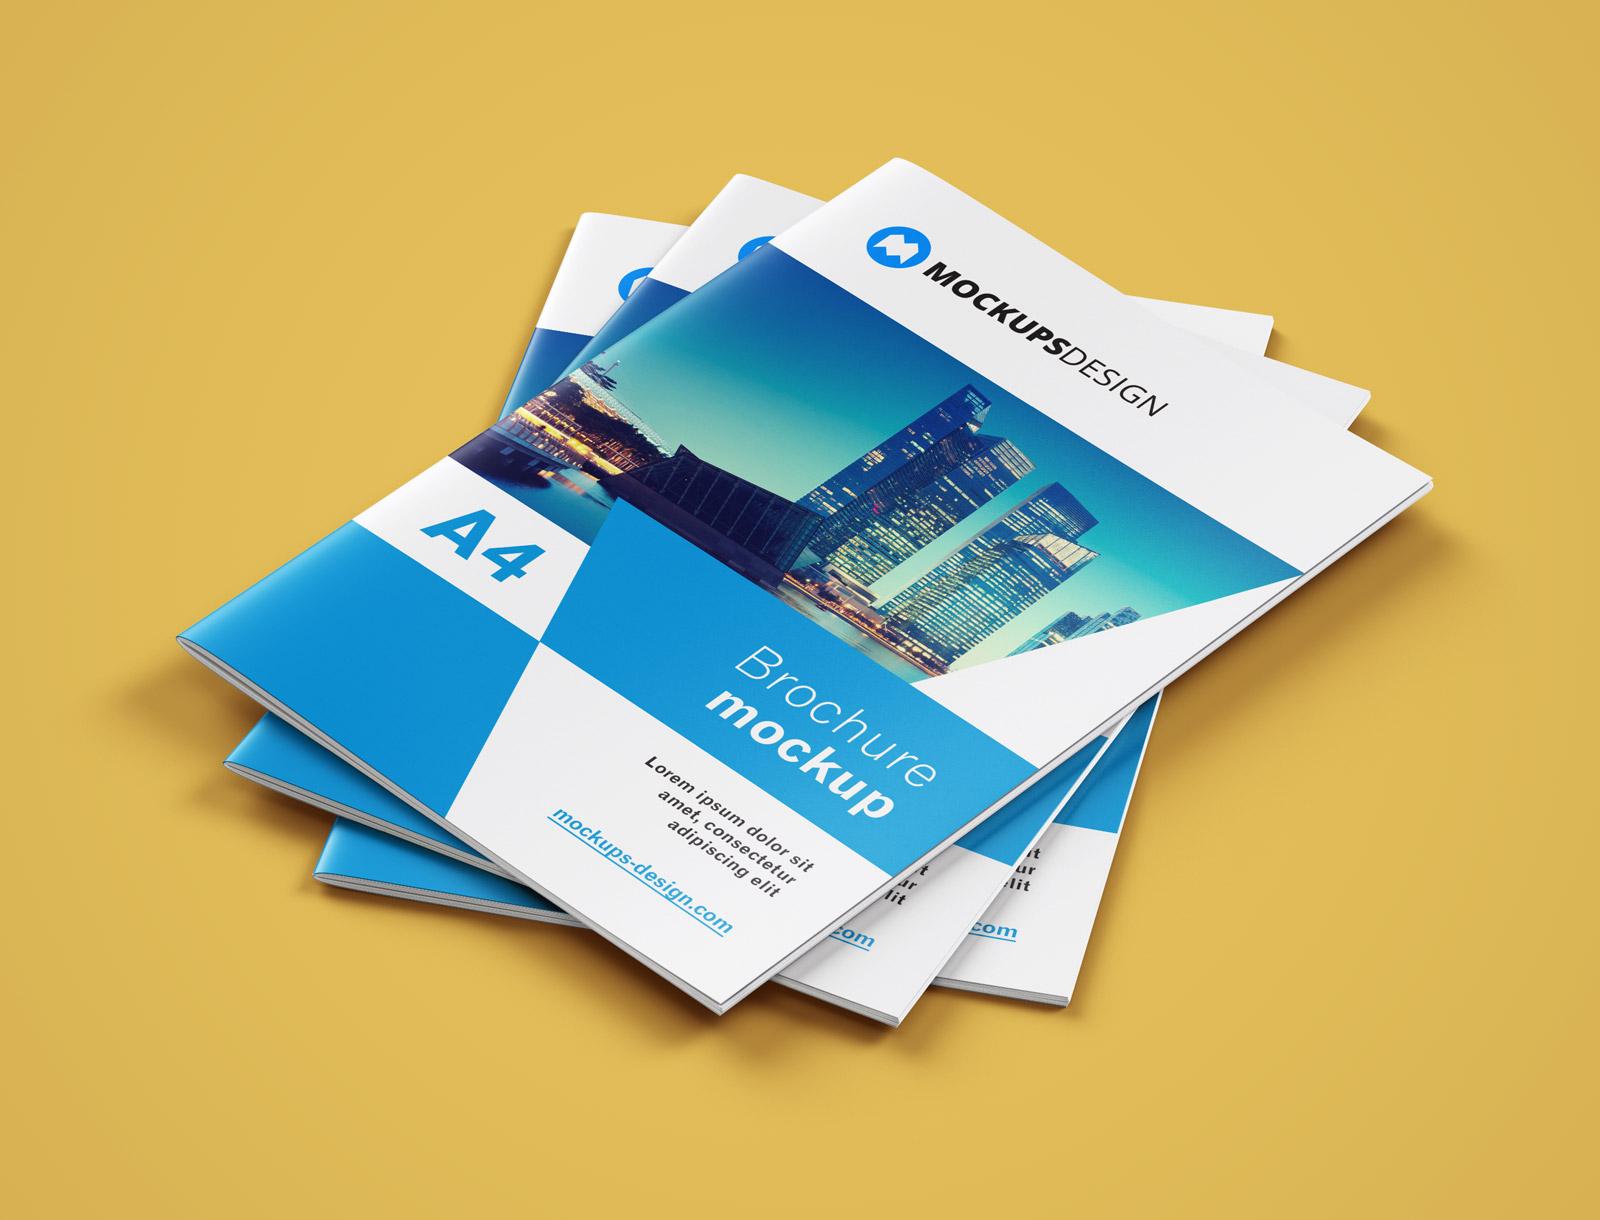 Free A4 Brochure Company Profile Mockup PSD (2)